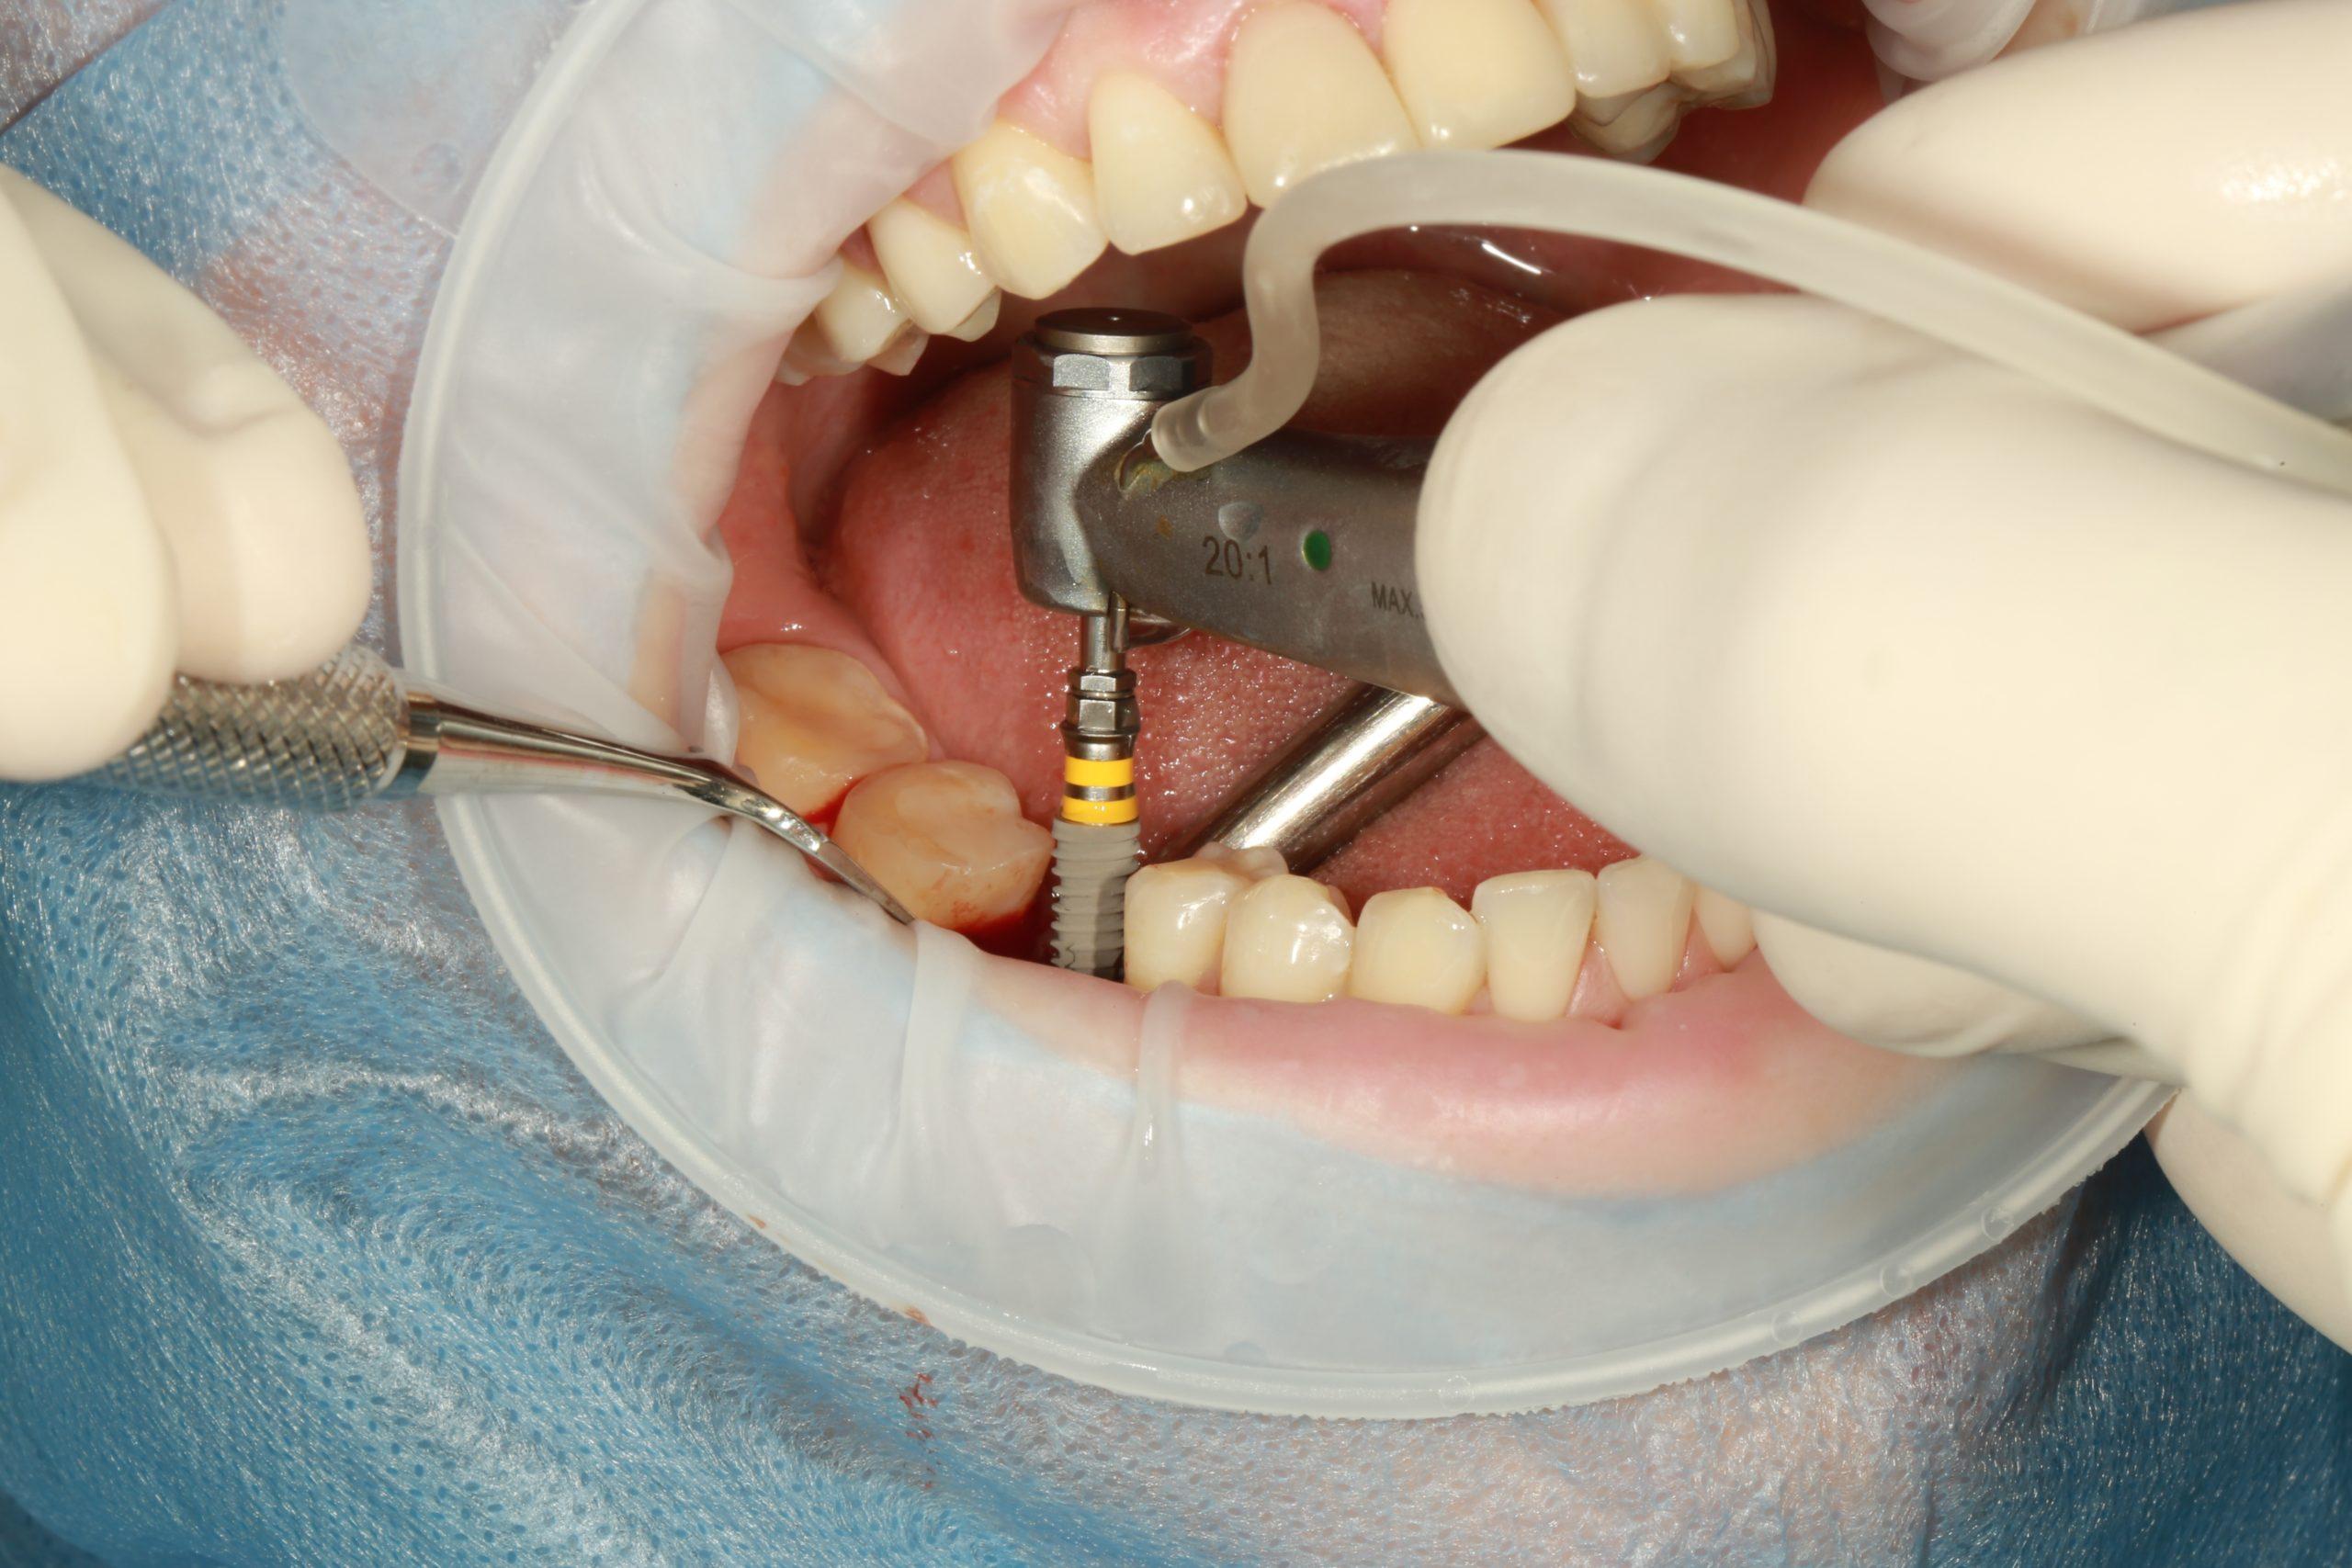 implanturi-dentare-chisinau-botanica-stomatolog